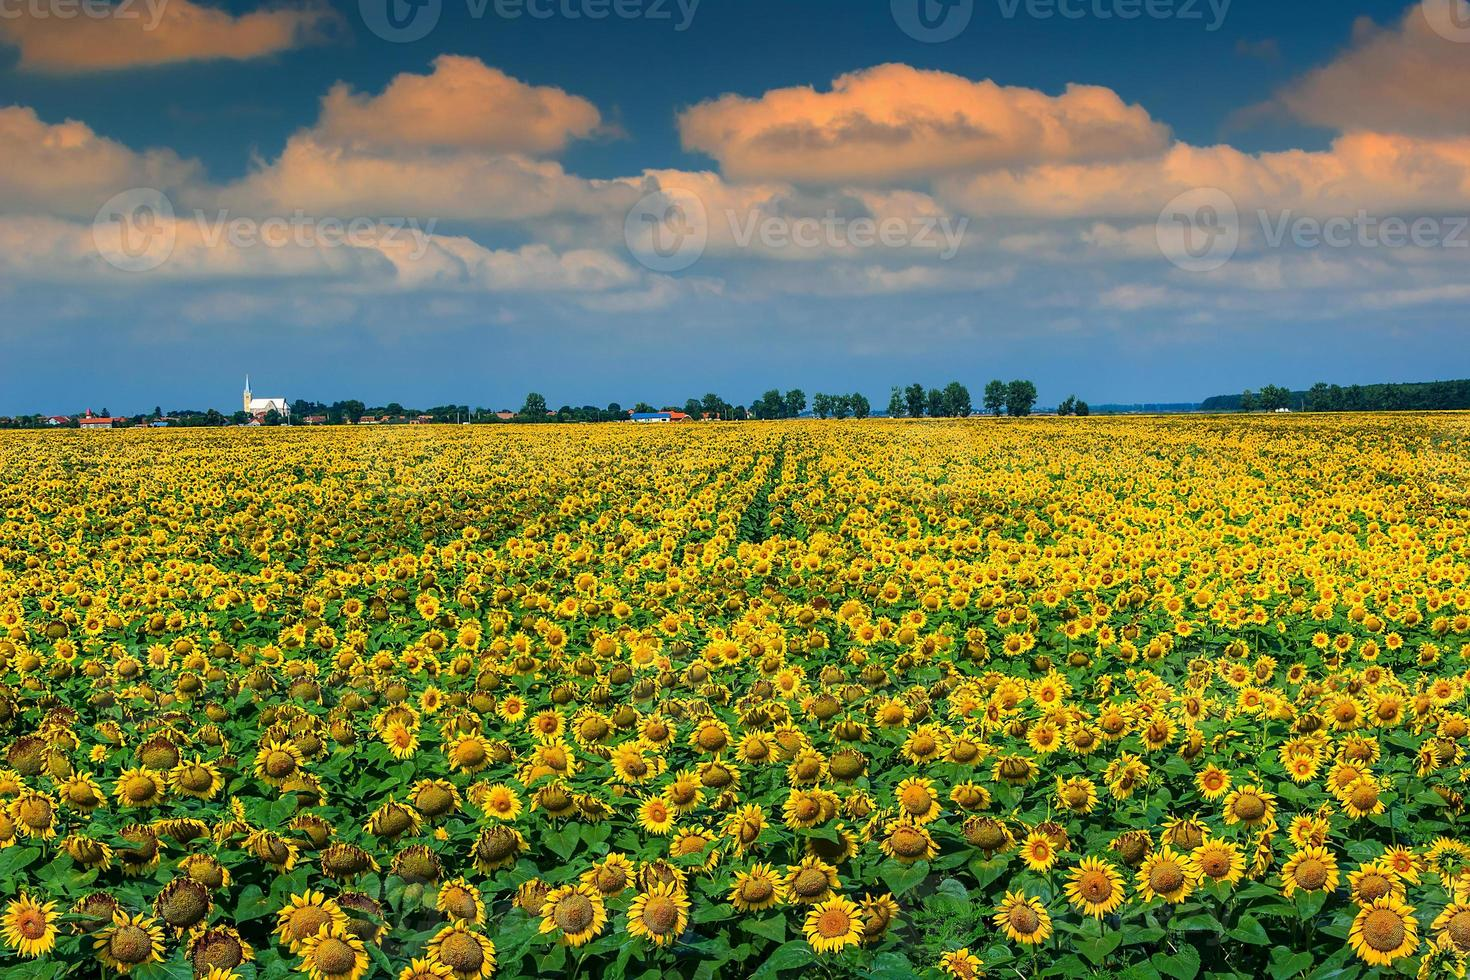 prachtig veld met zonnebloemen en bewolkte hemel, buzias, roemenië, europa foto